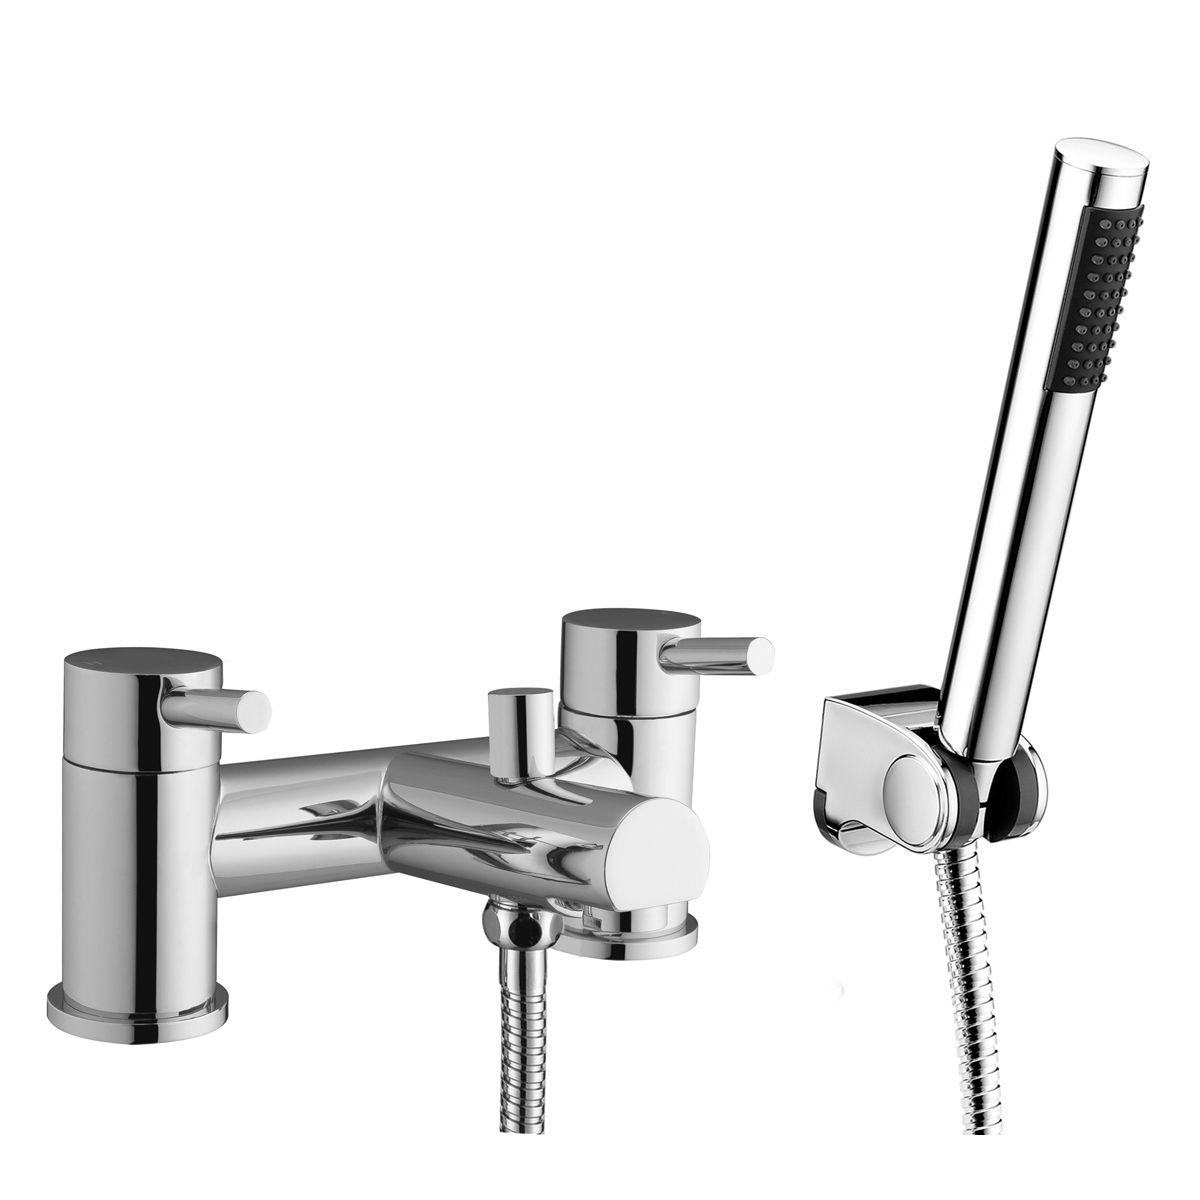 RAK Prima Deck Mounted Shower Bath Mixer Tap